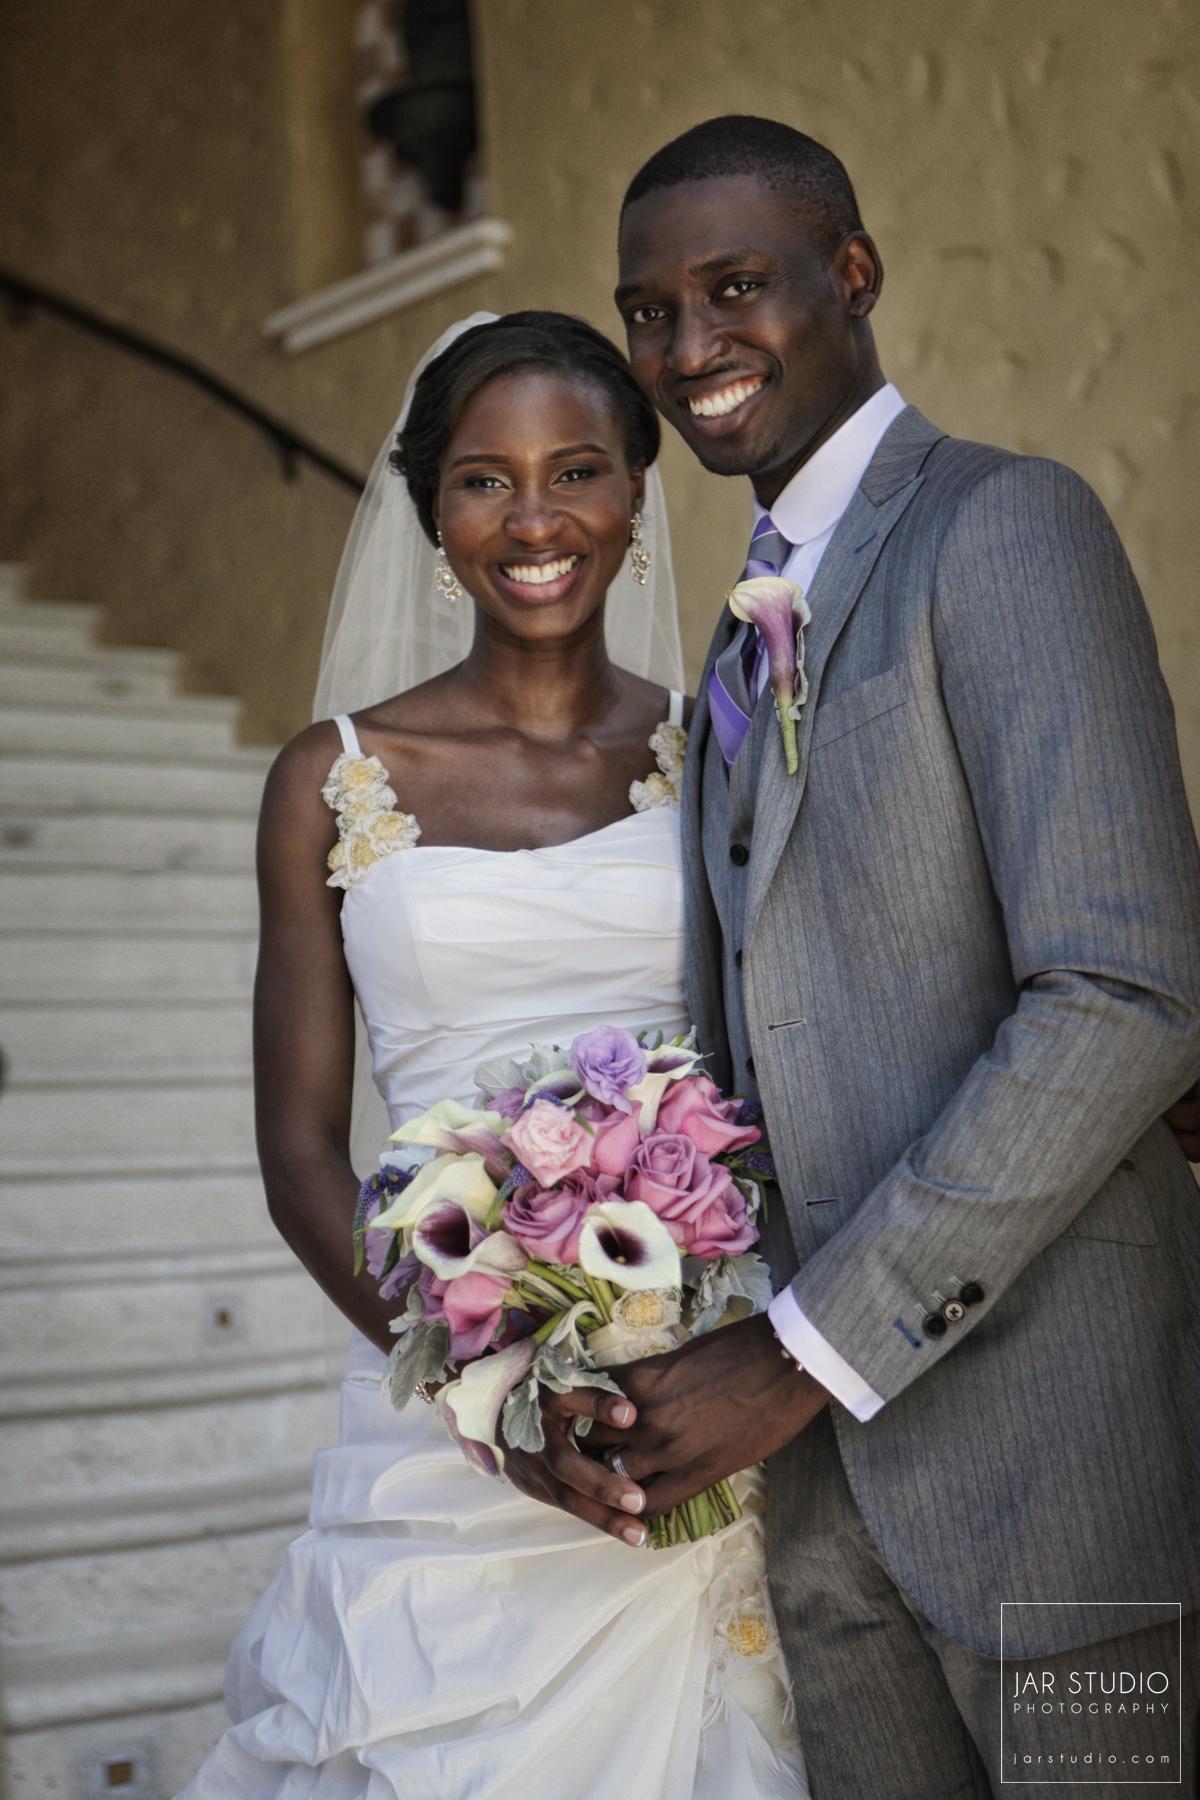 23-nigerian-couple-gettin-married-destination-disney-wedding-photographer.JPG